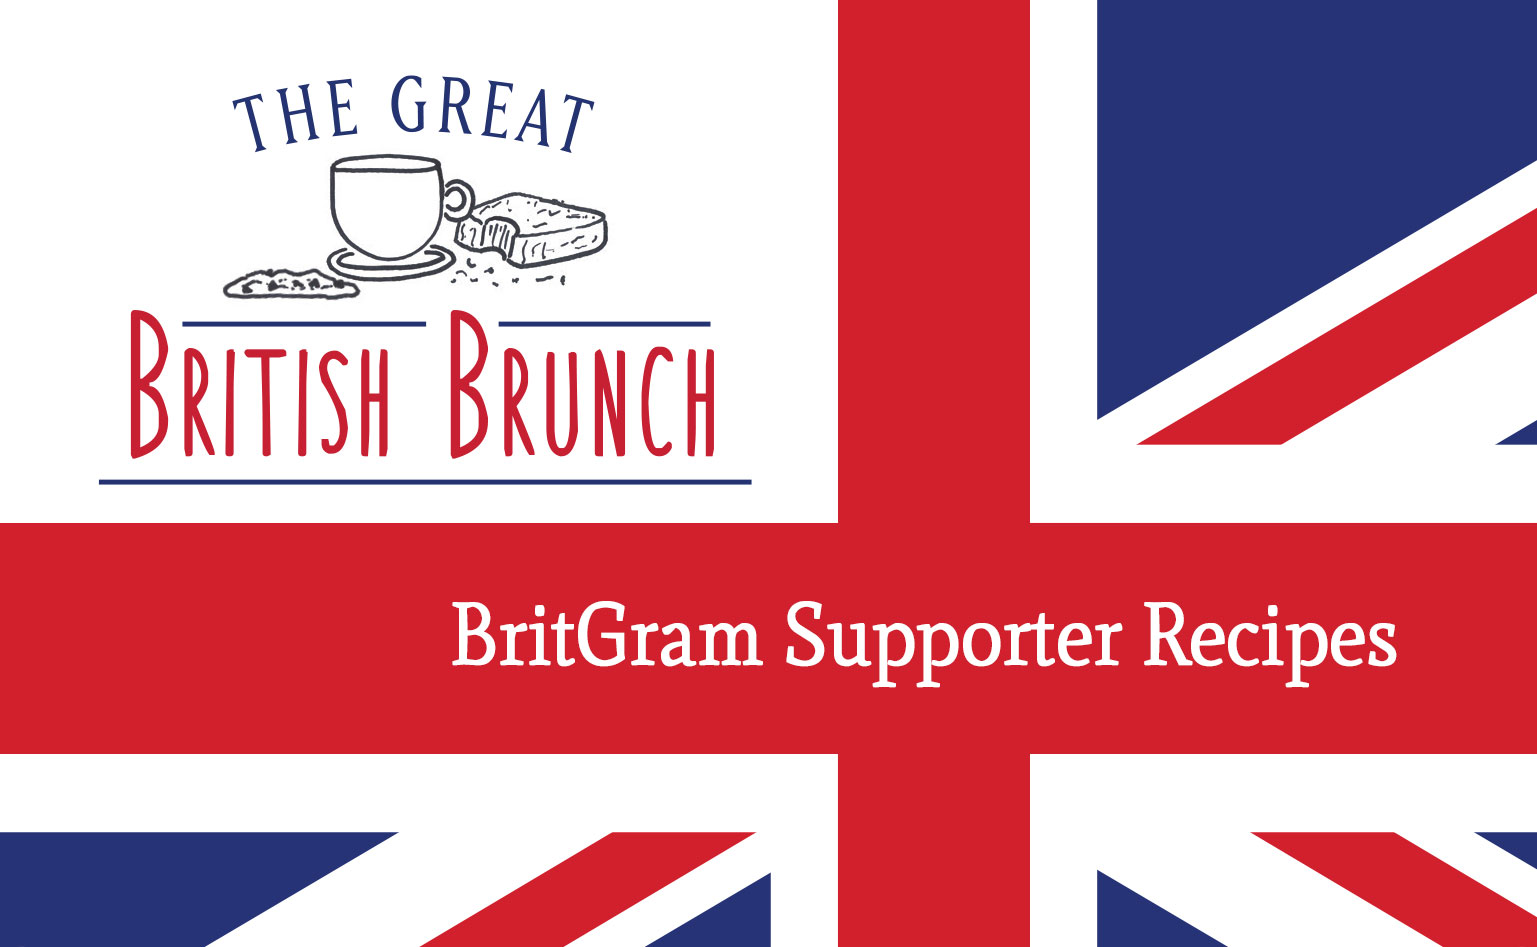 BritGram Supporter Recipes